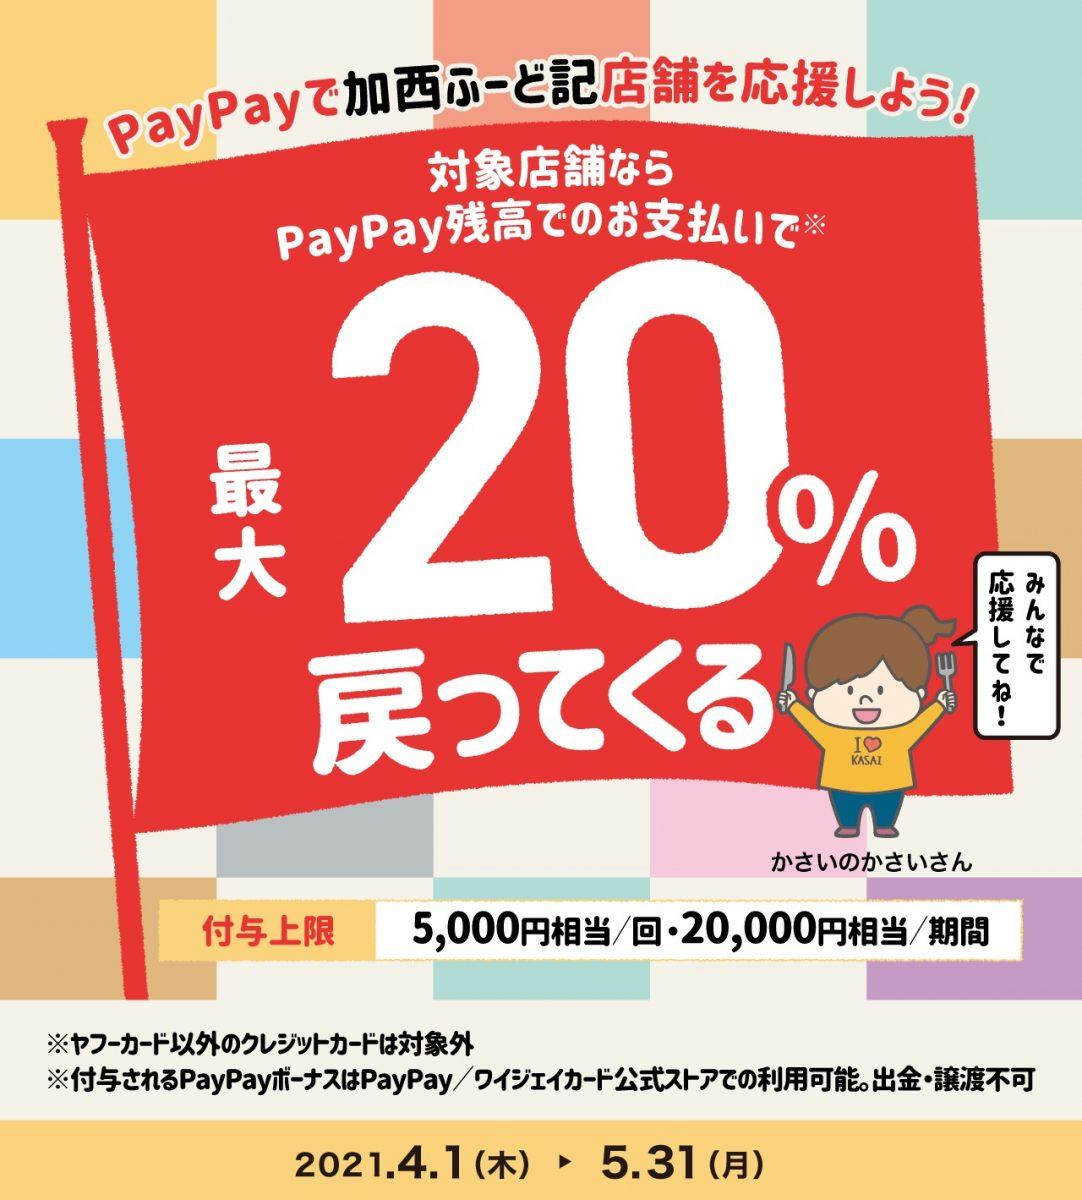 PayPAYで「加西ふーど記」店舗応援キャンペーン